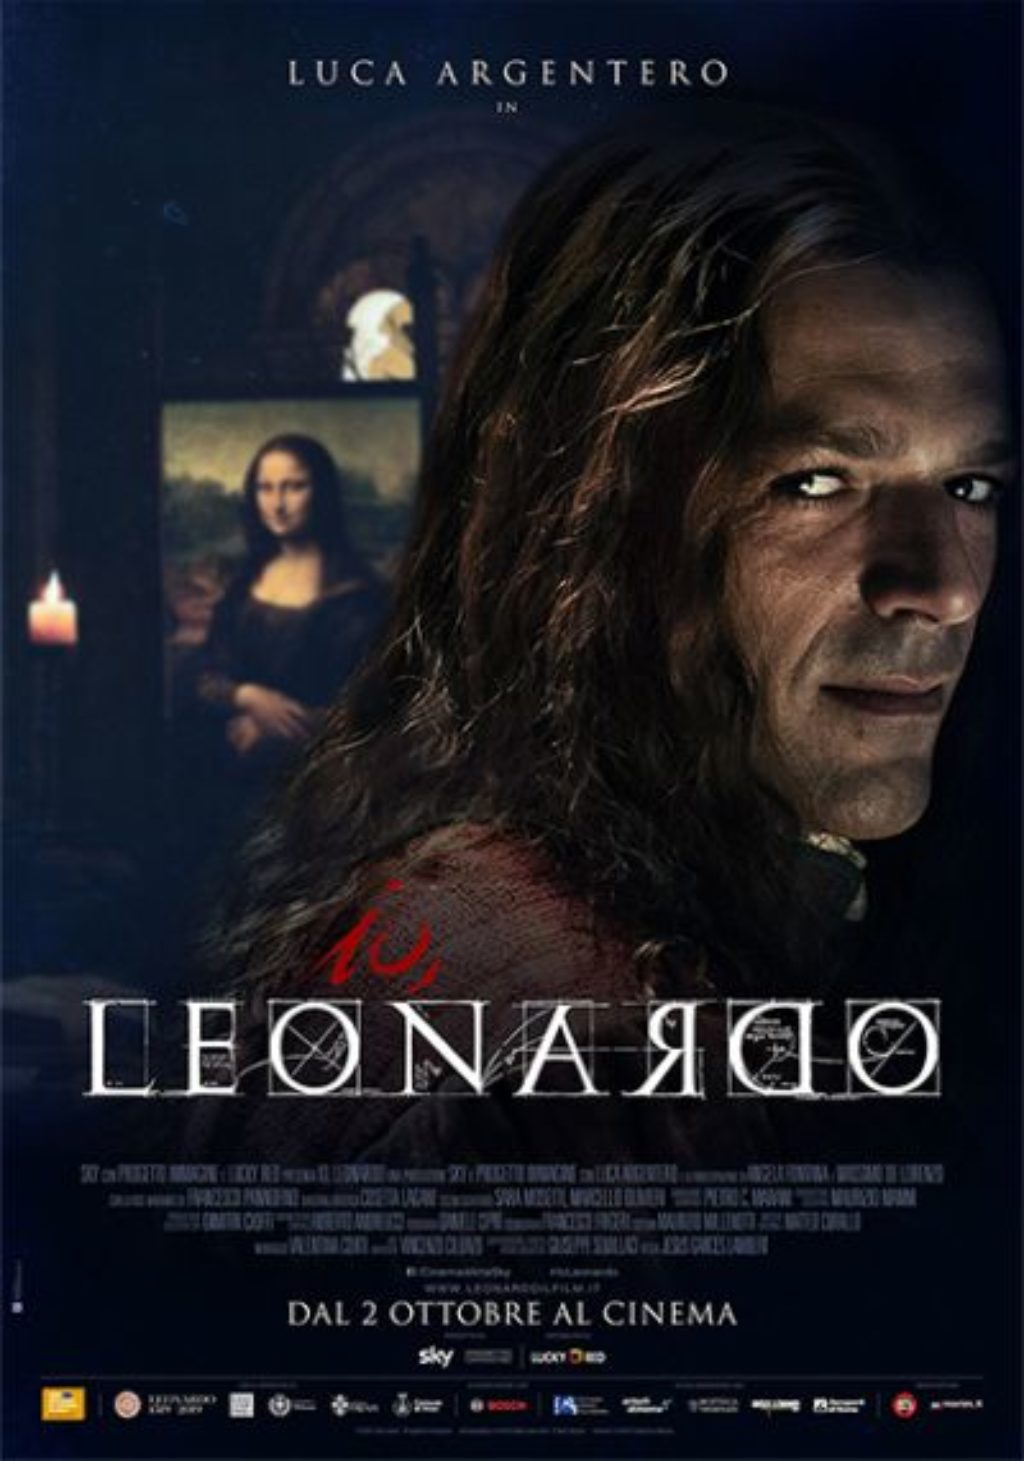 ioleonardo_big